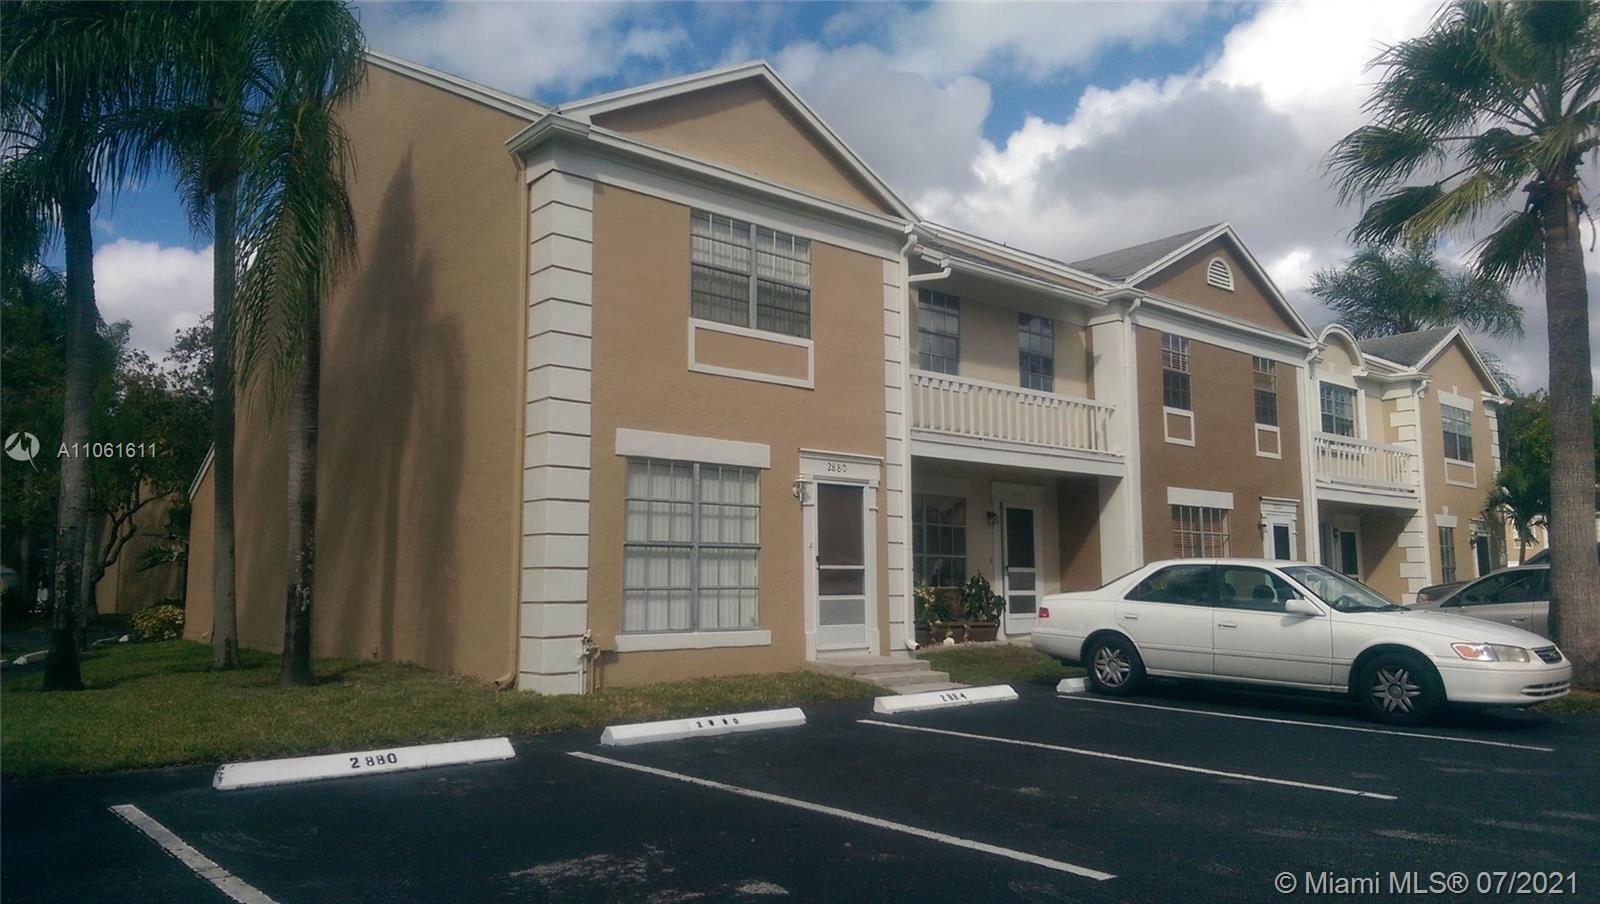 Photo of 2880 Belmont Ln #2880, Cooper City, FL 33026 (MLS # A11061611)